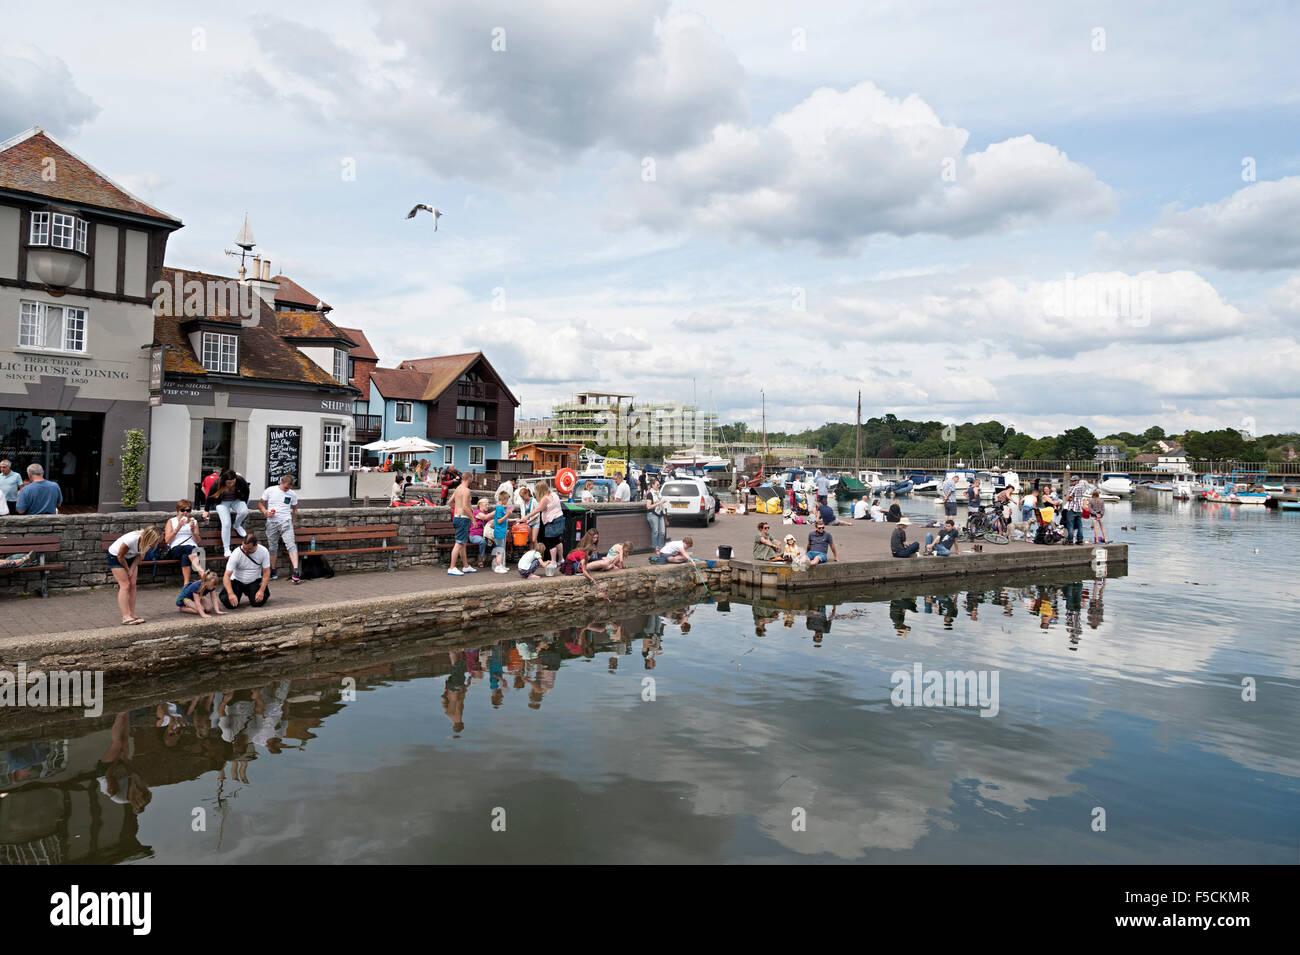 crabbing holiday fun quayside lymington hampshire Stock Photo